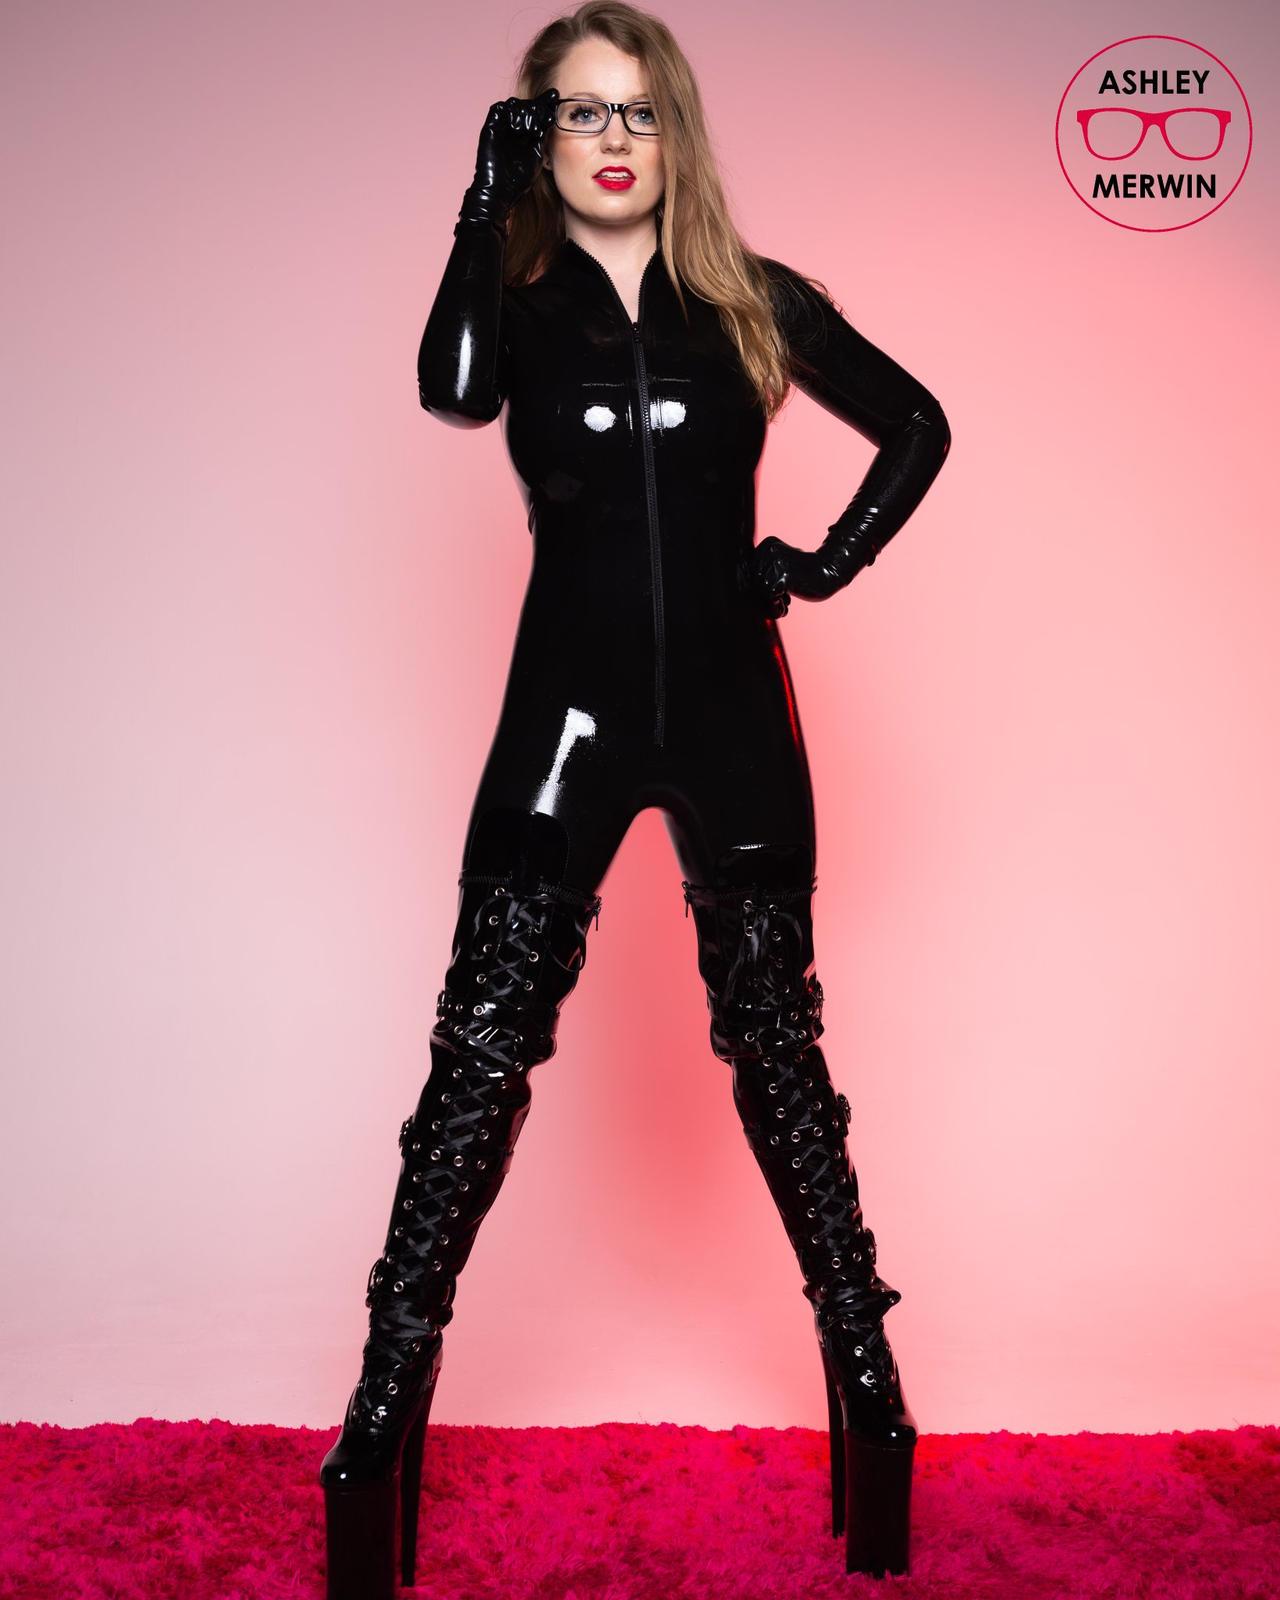 Ashley Merwin - Black Latex Catsuit